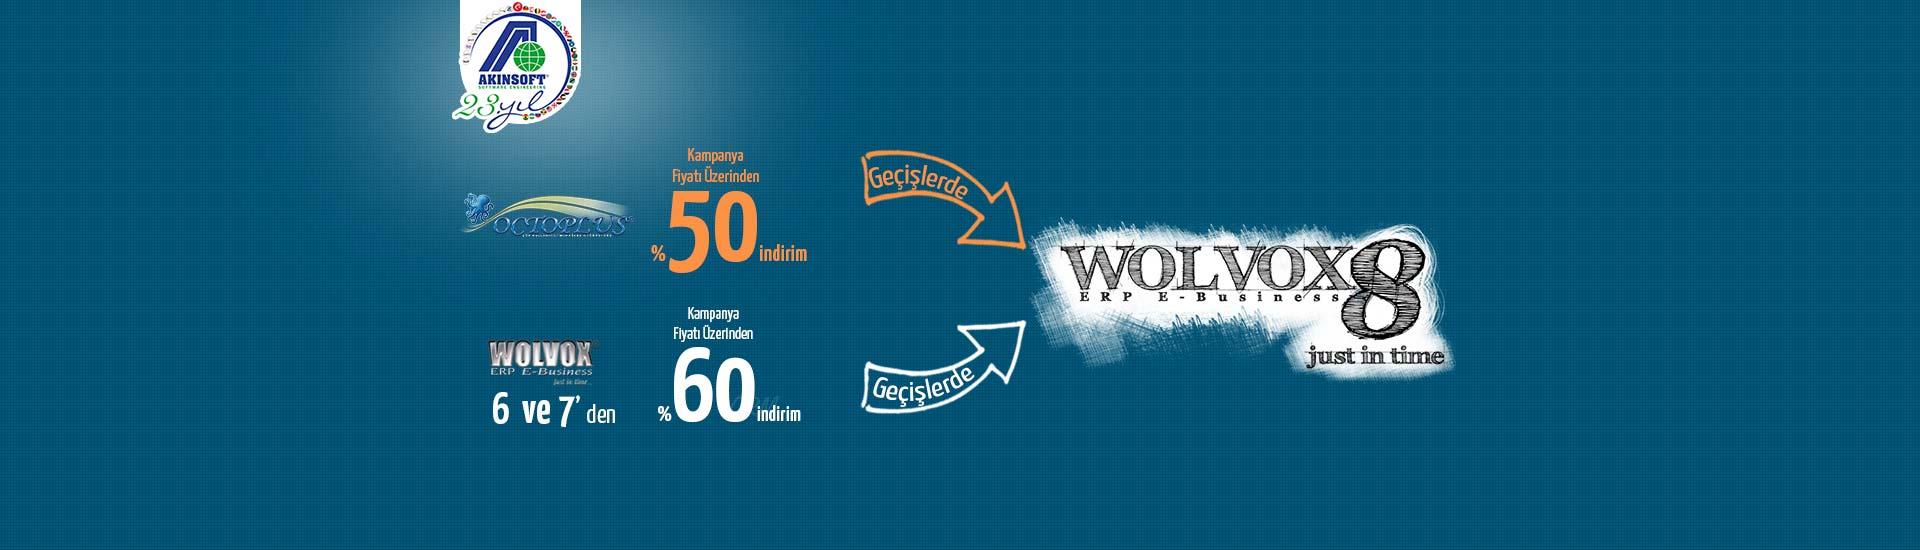 Octoplus, WOLVOX 6 ve 7 den WOLVOX 8'e geçiş